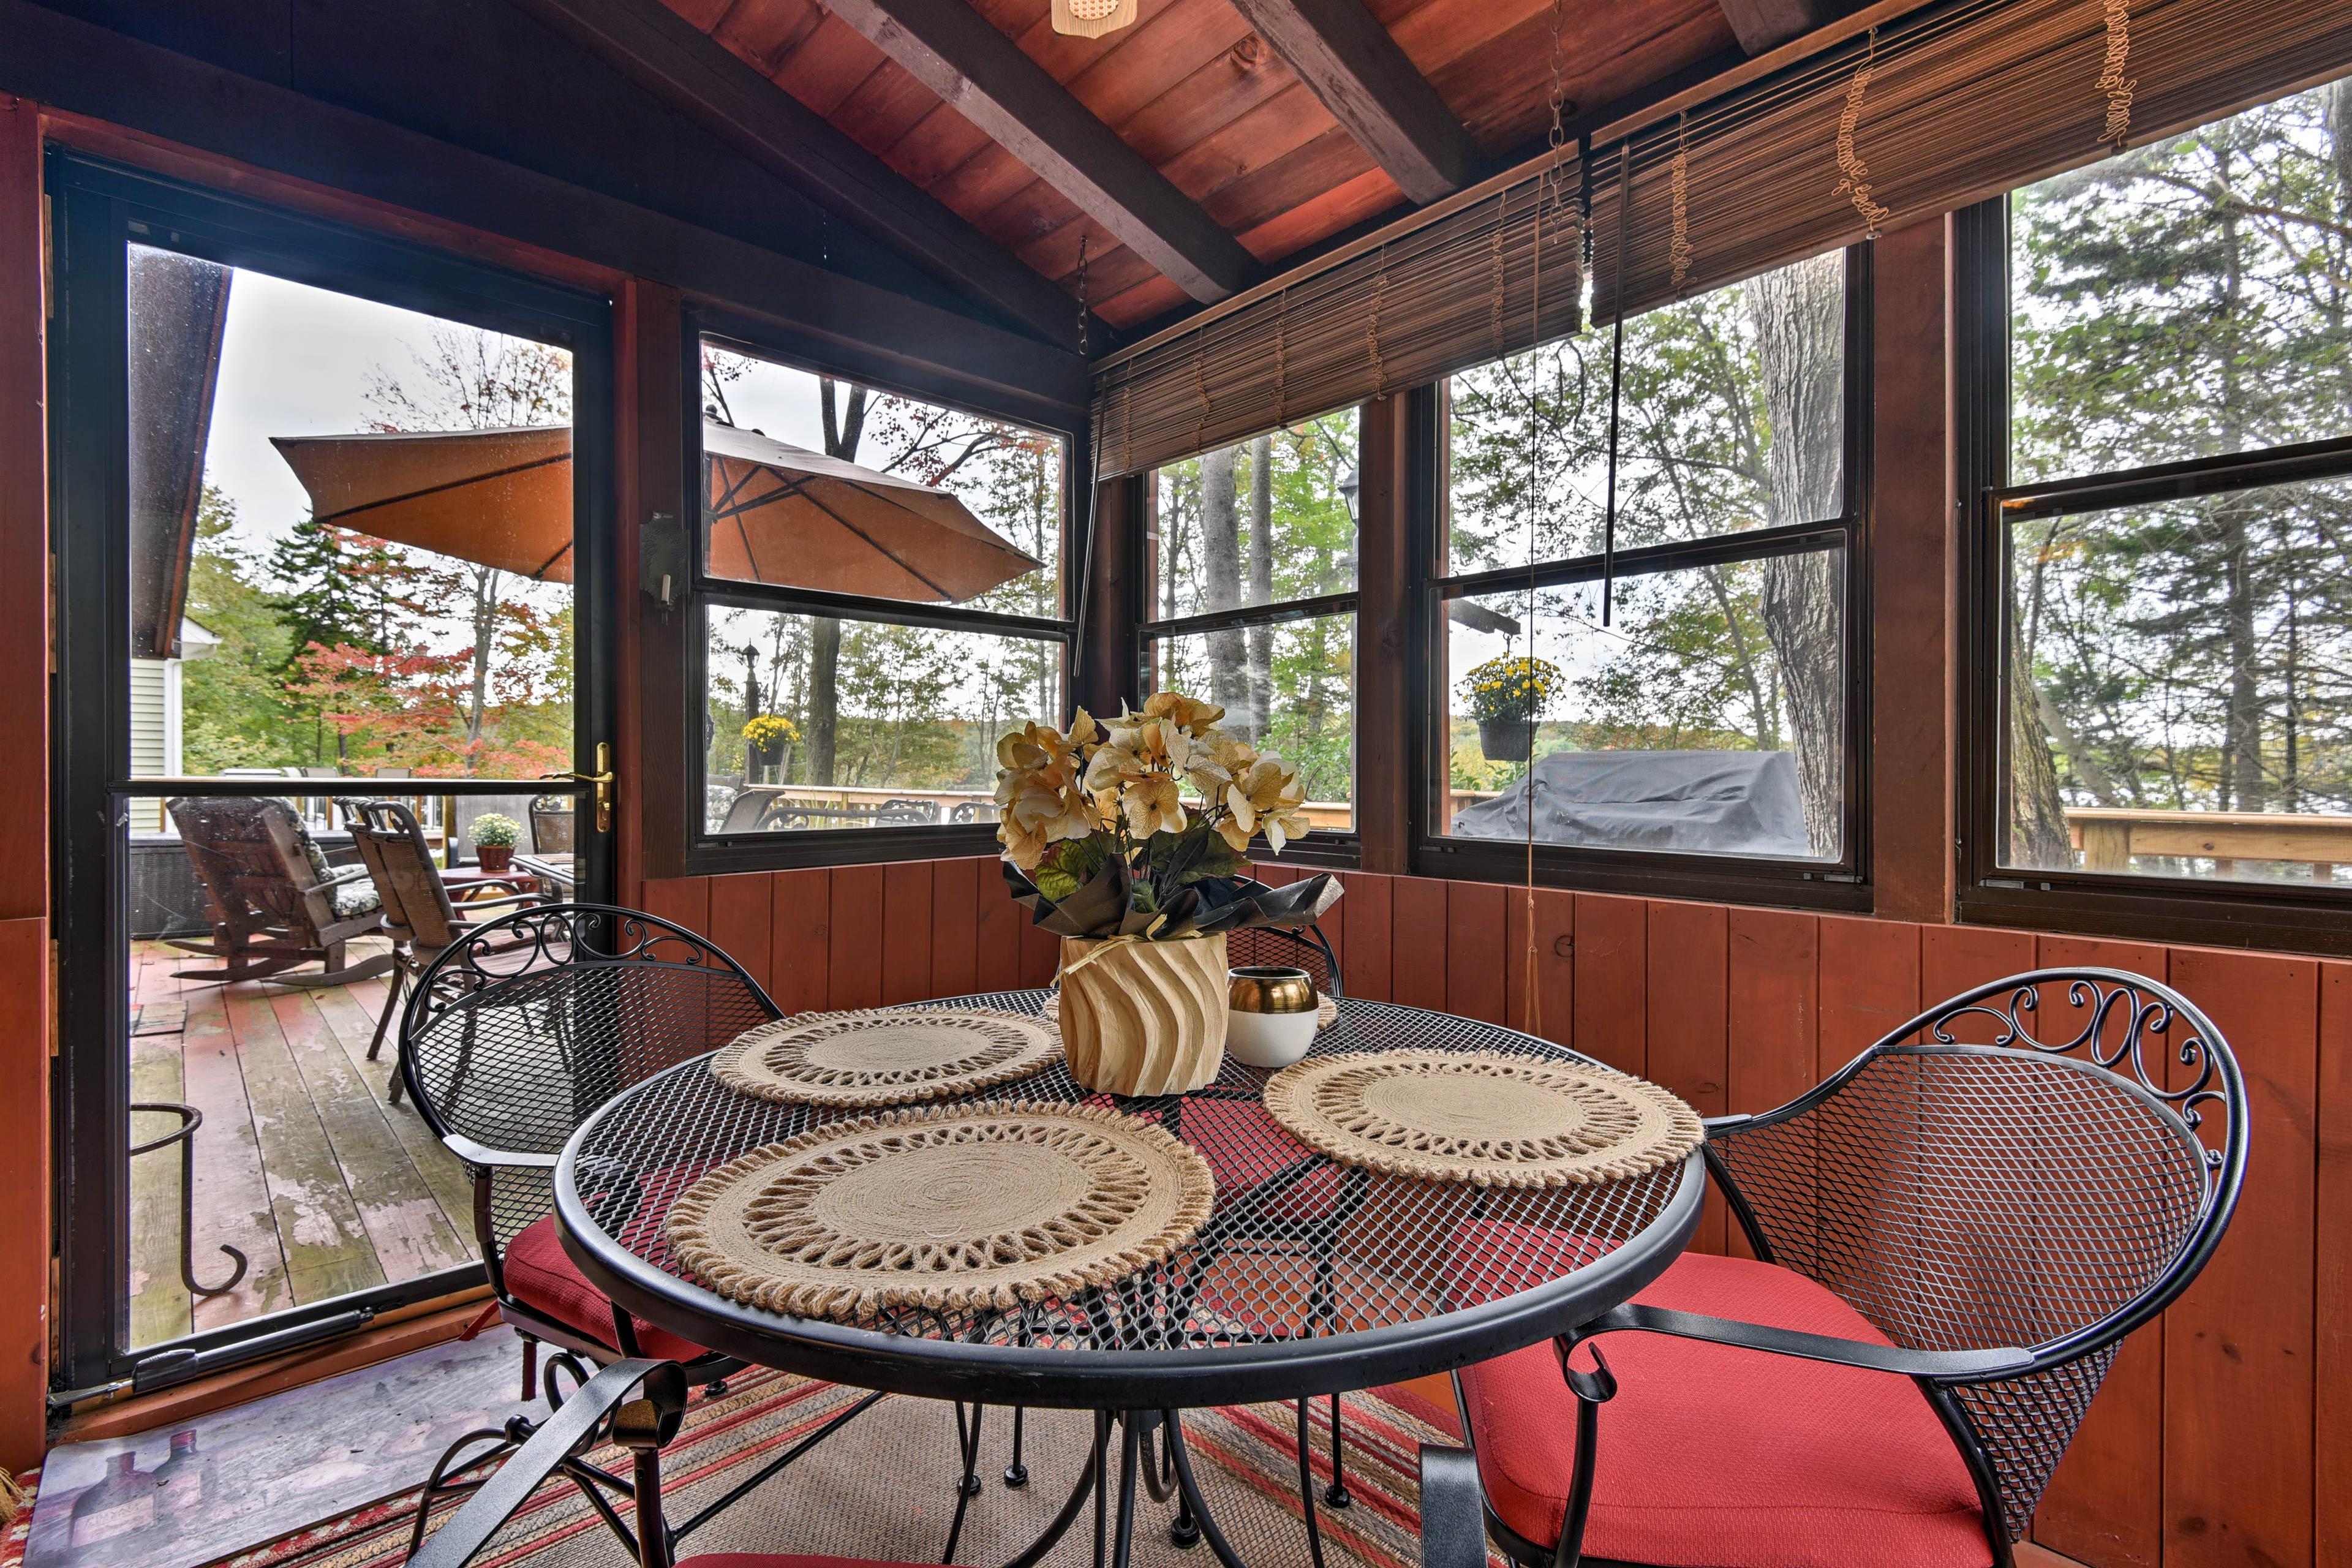 Enjoy meals in the screened-in breakfast porch.